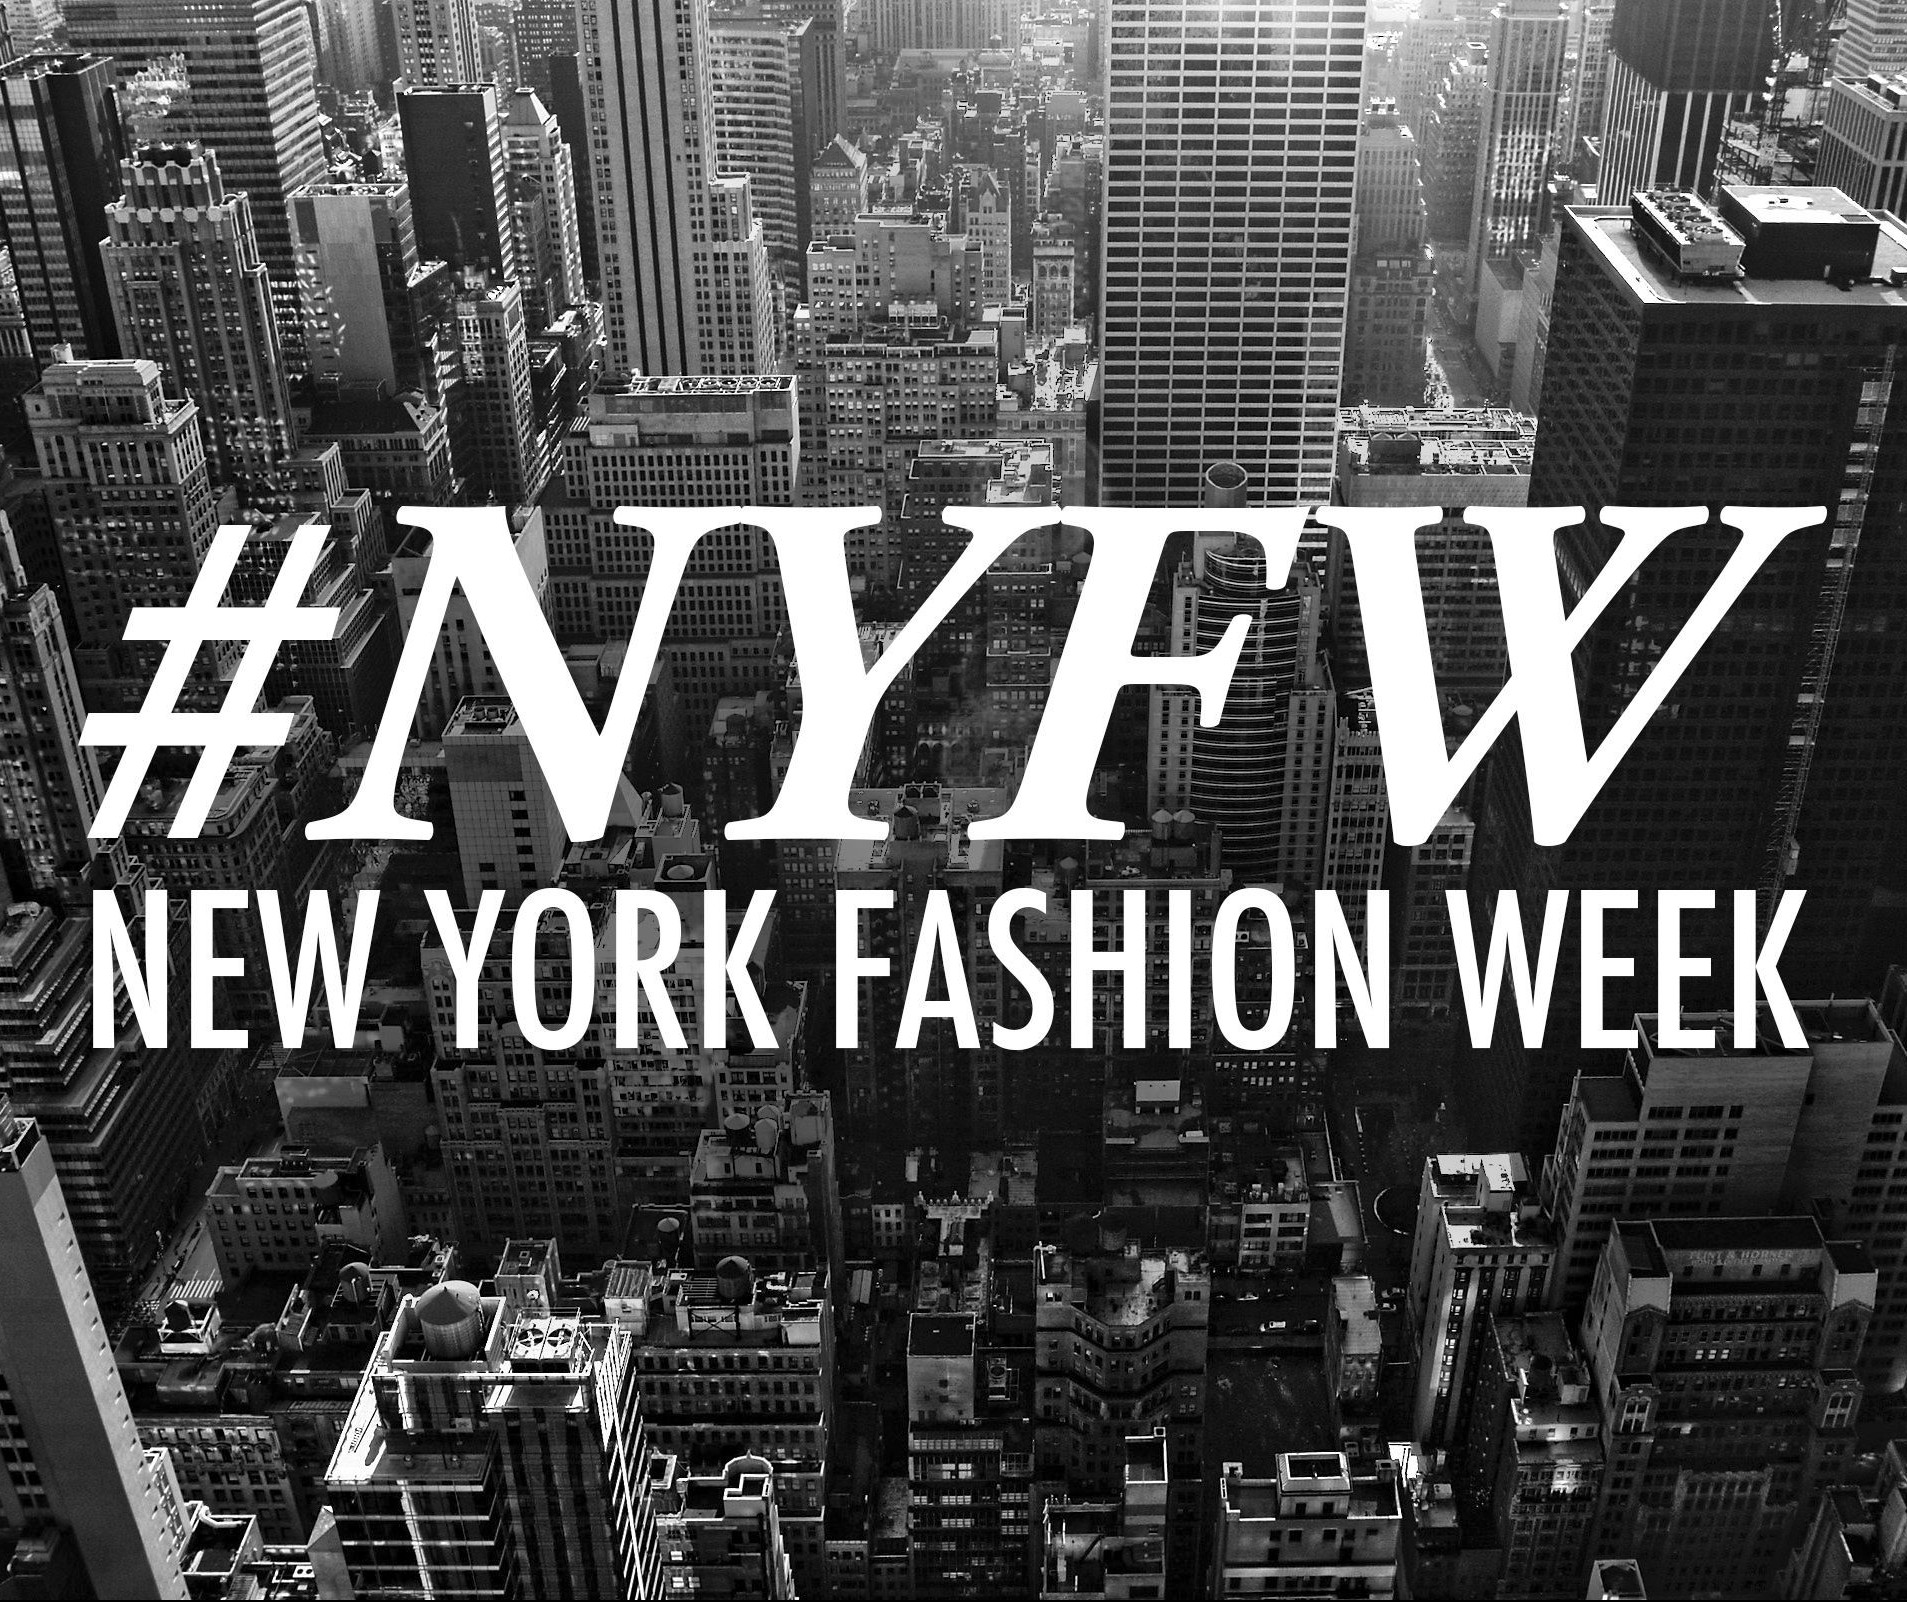 Assunto de hoje: New York Fashion Week